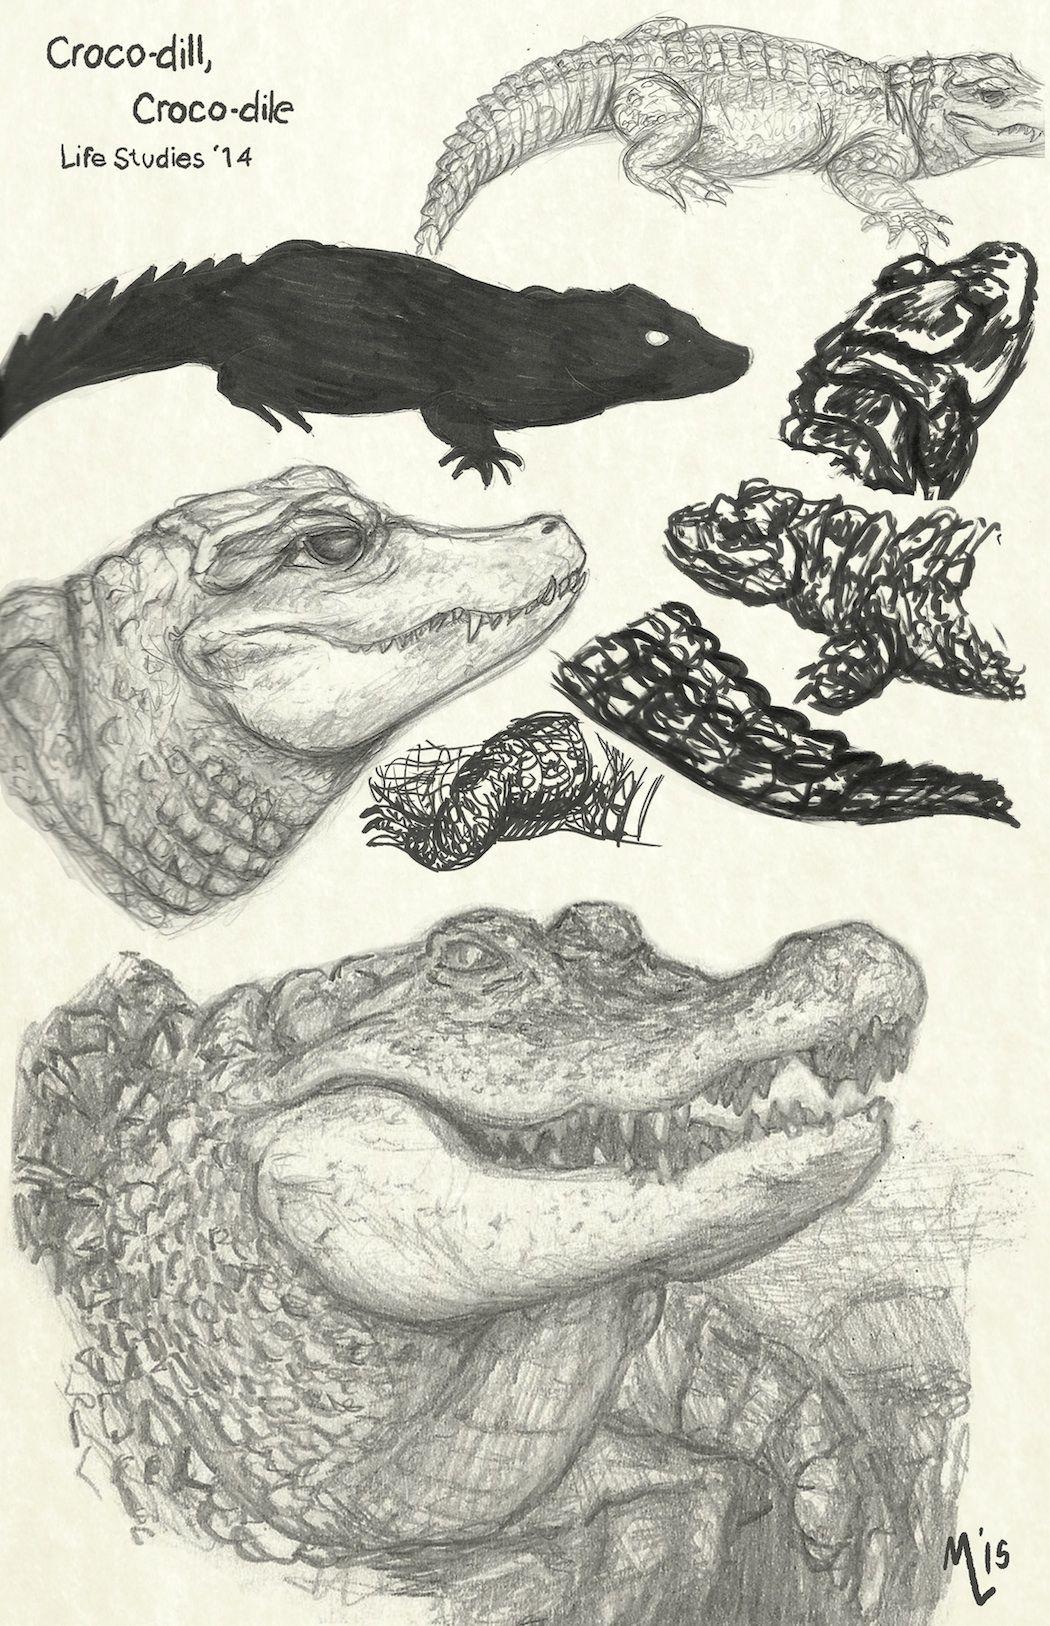 Realistic Alligator Drawing : realistic, alligator, drawing, Alligator/Crocodile, Sketches, Crocodile, Illustration,, Animal, Drawings,, Snake, Drawing